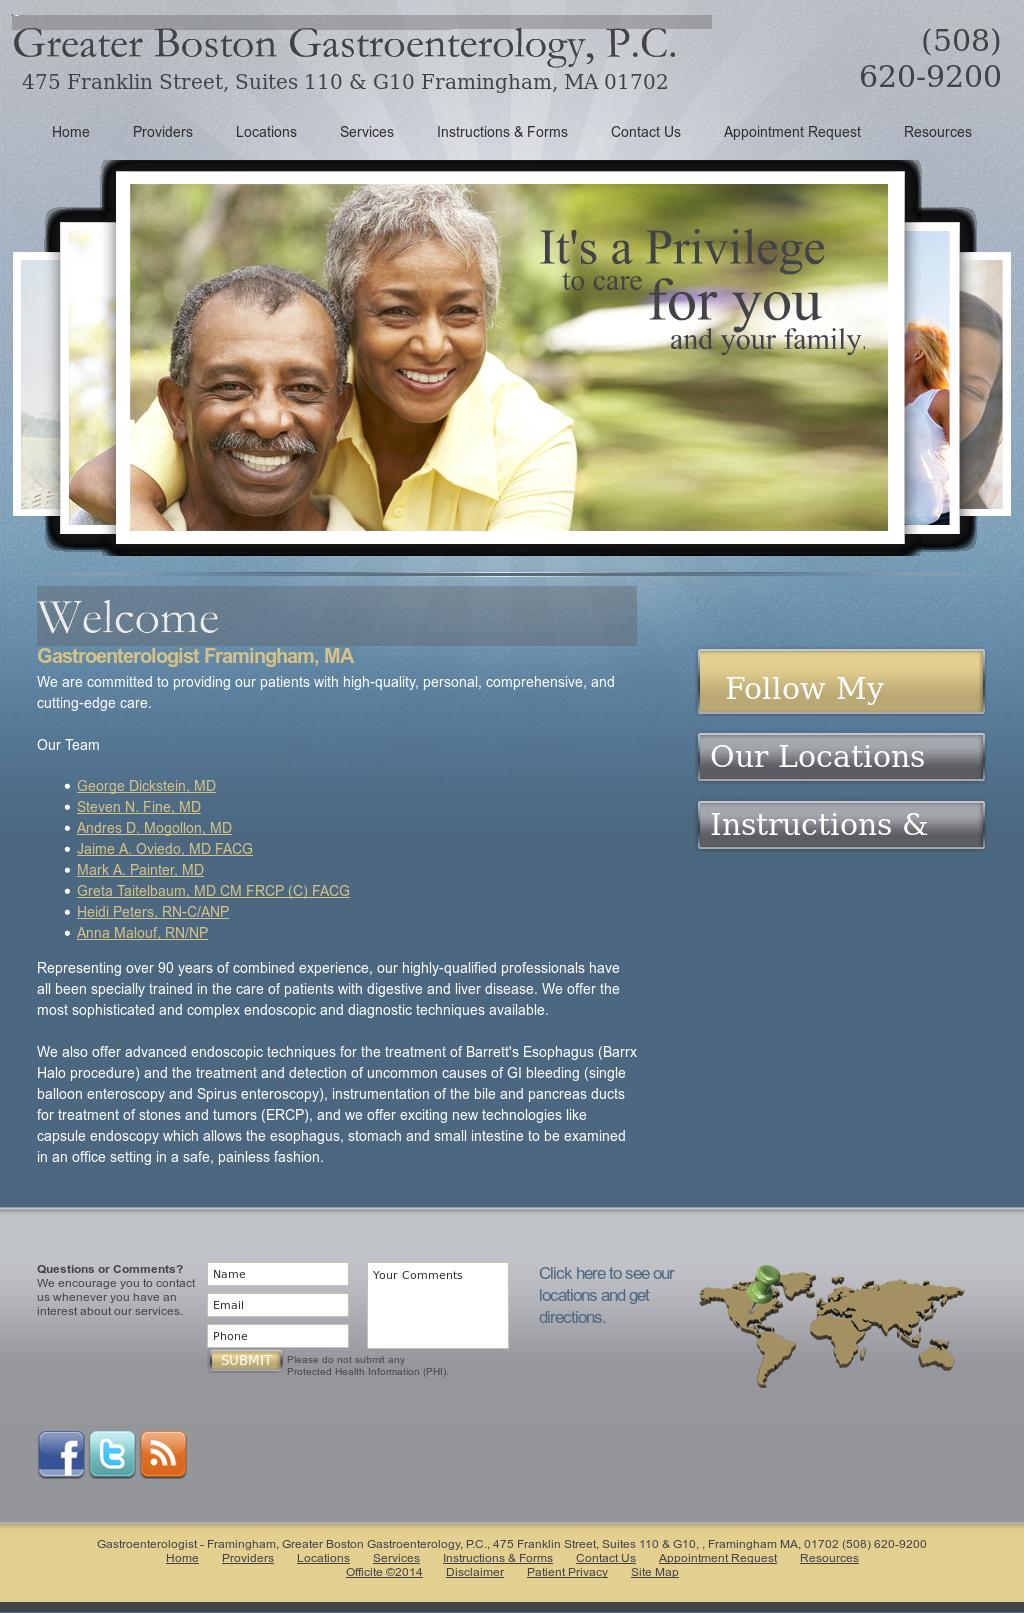 Greater Boston Gastroenterology, P c Competitors, Revenue and